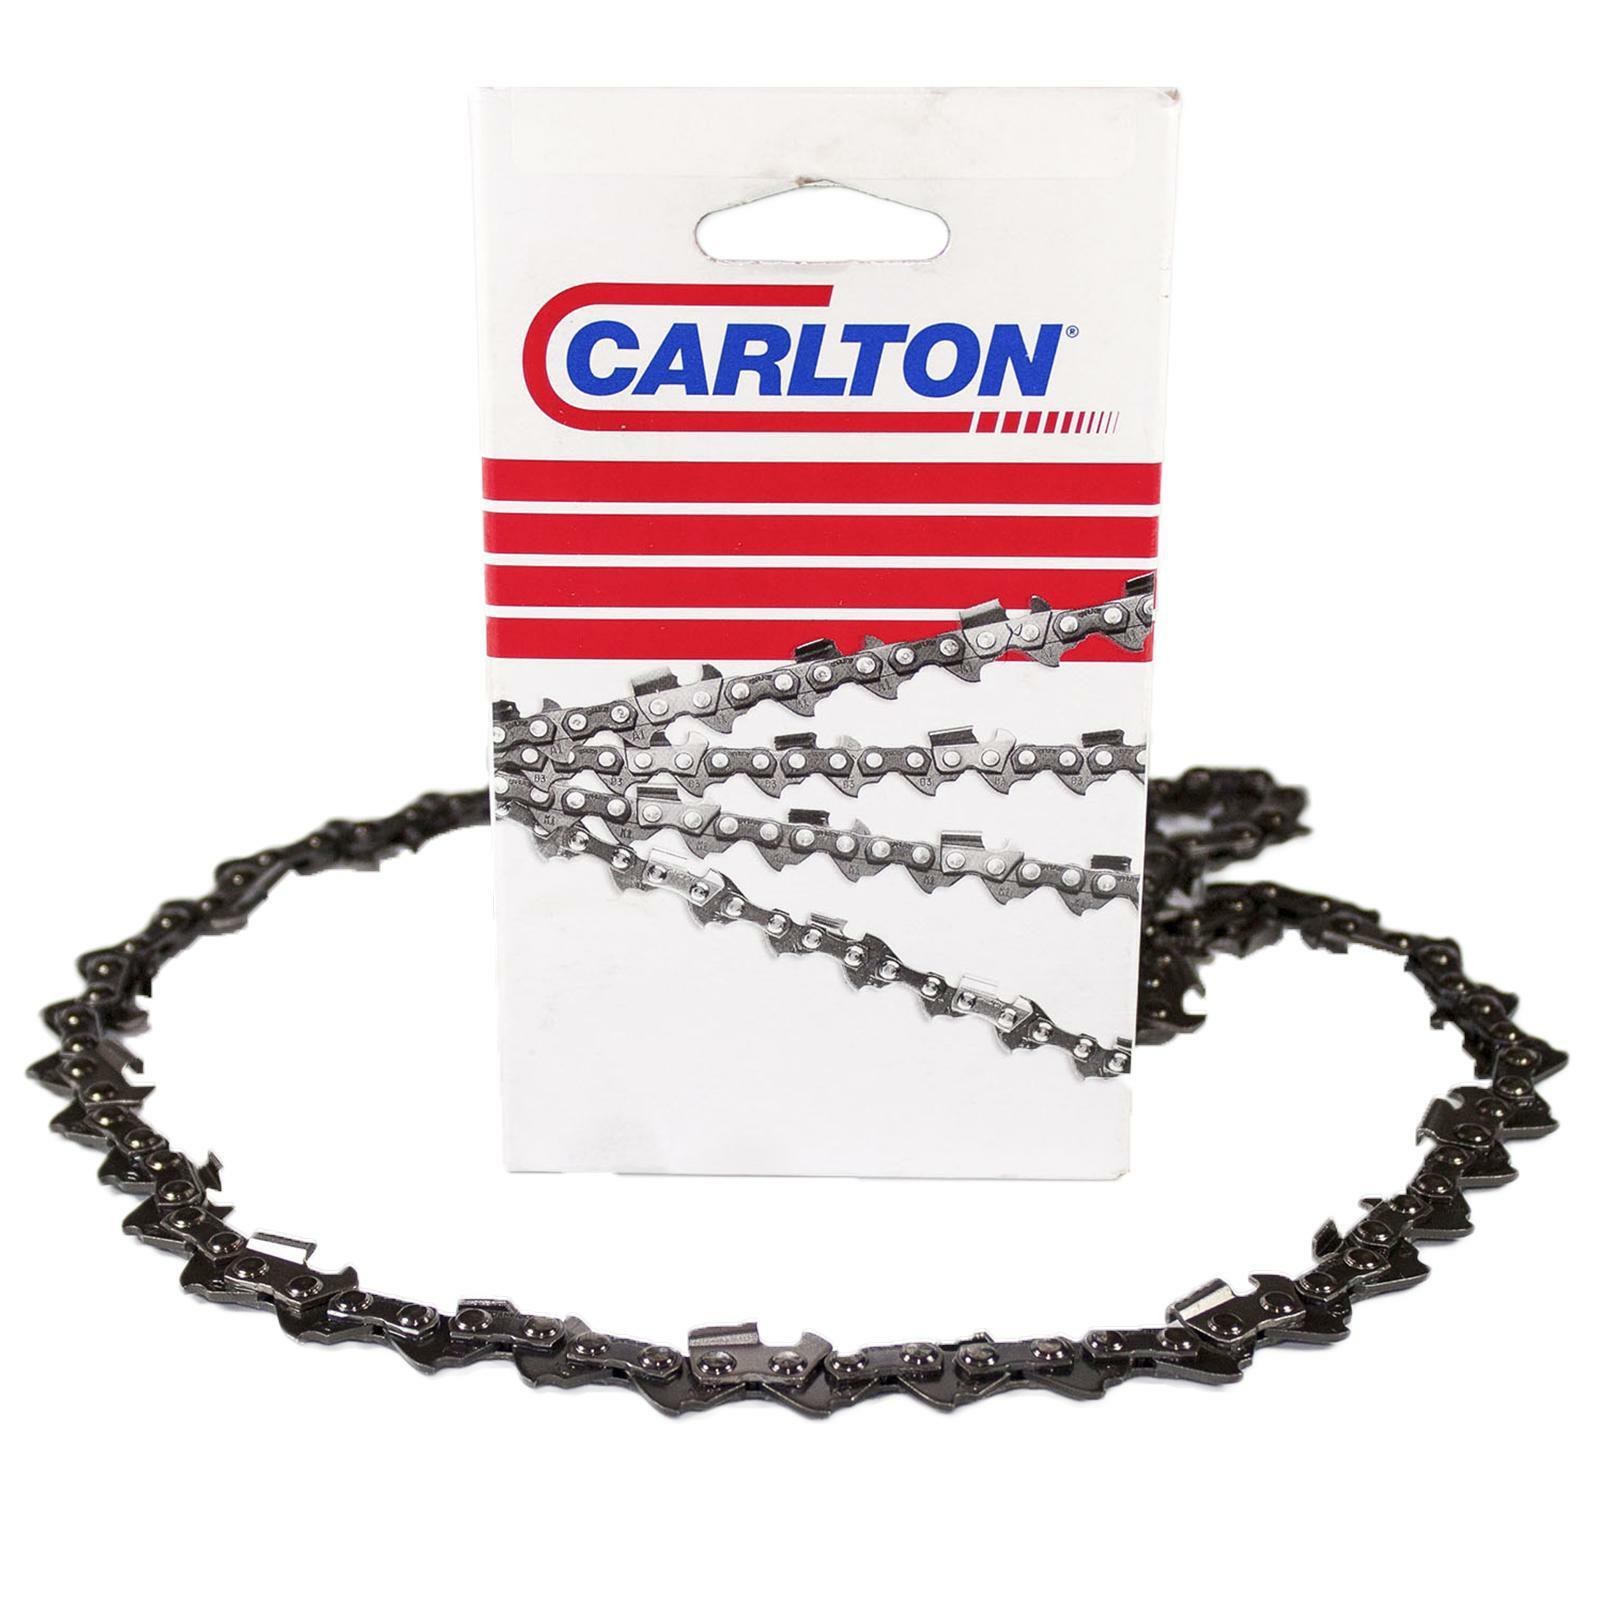 carlton catena per motosega carlton 3.25 sp 1.5 cm 45 72 maglie